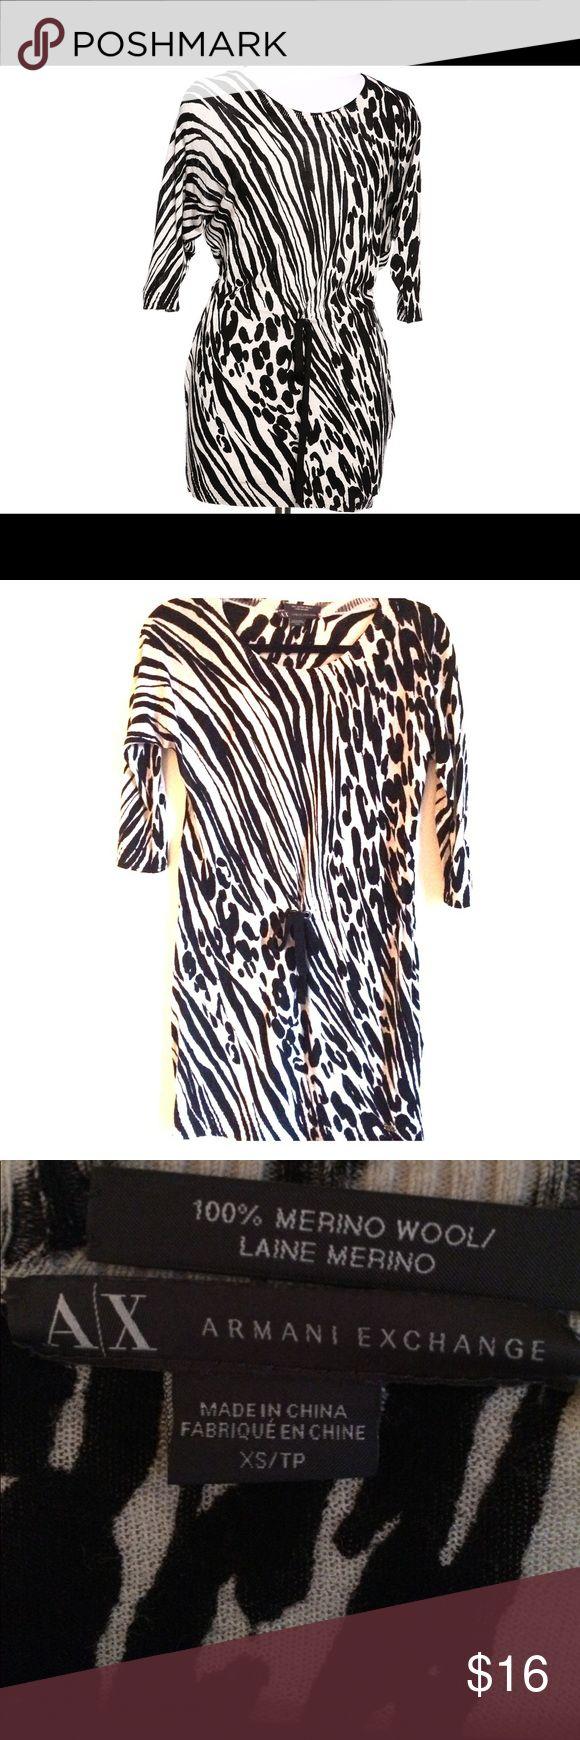 SALE - Armani Exchange Zebra Print Dress Long Sleeved zebra print dress/tunic. Perfect for winter. Truth to size. No trades. Like New! A/X Armani Exchange Dresses Long Sleeve